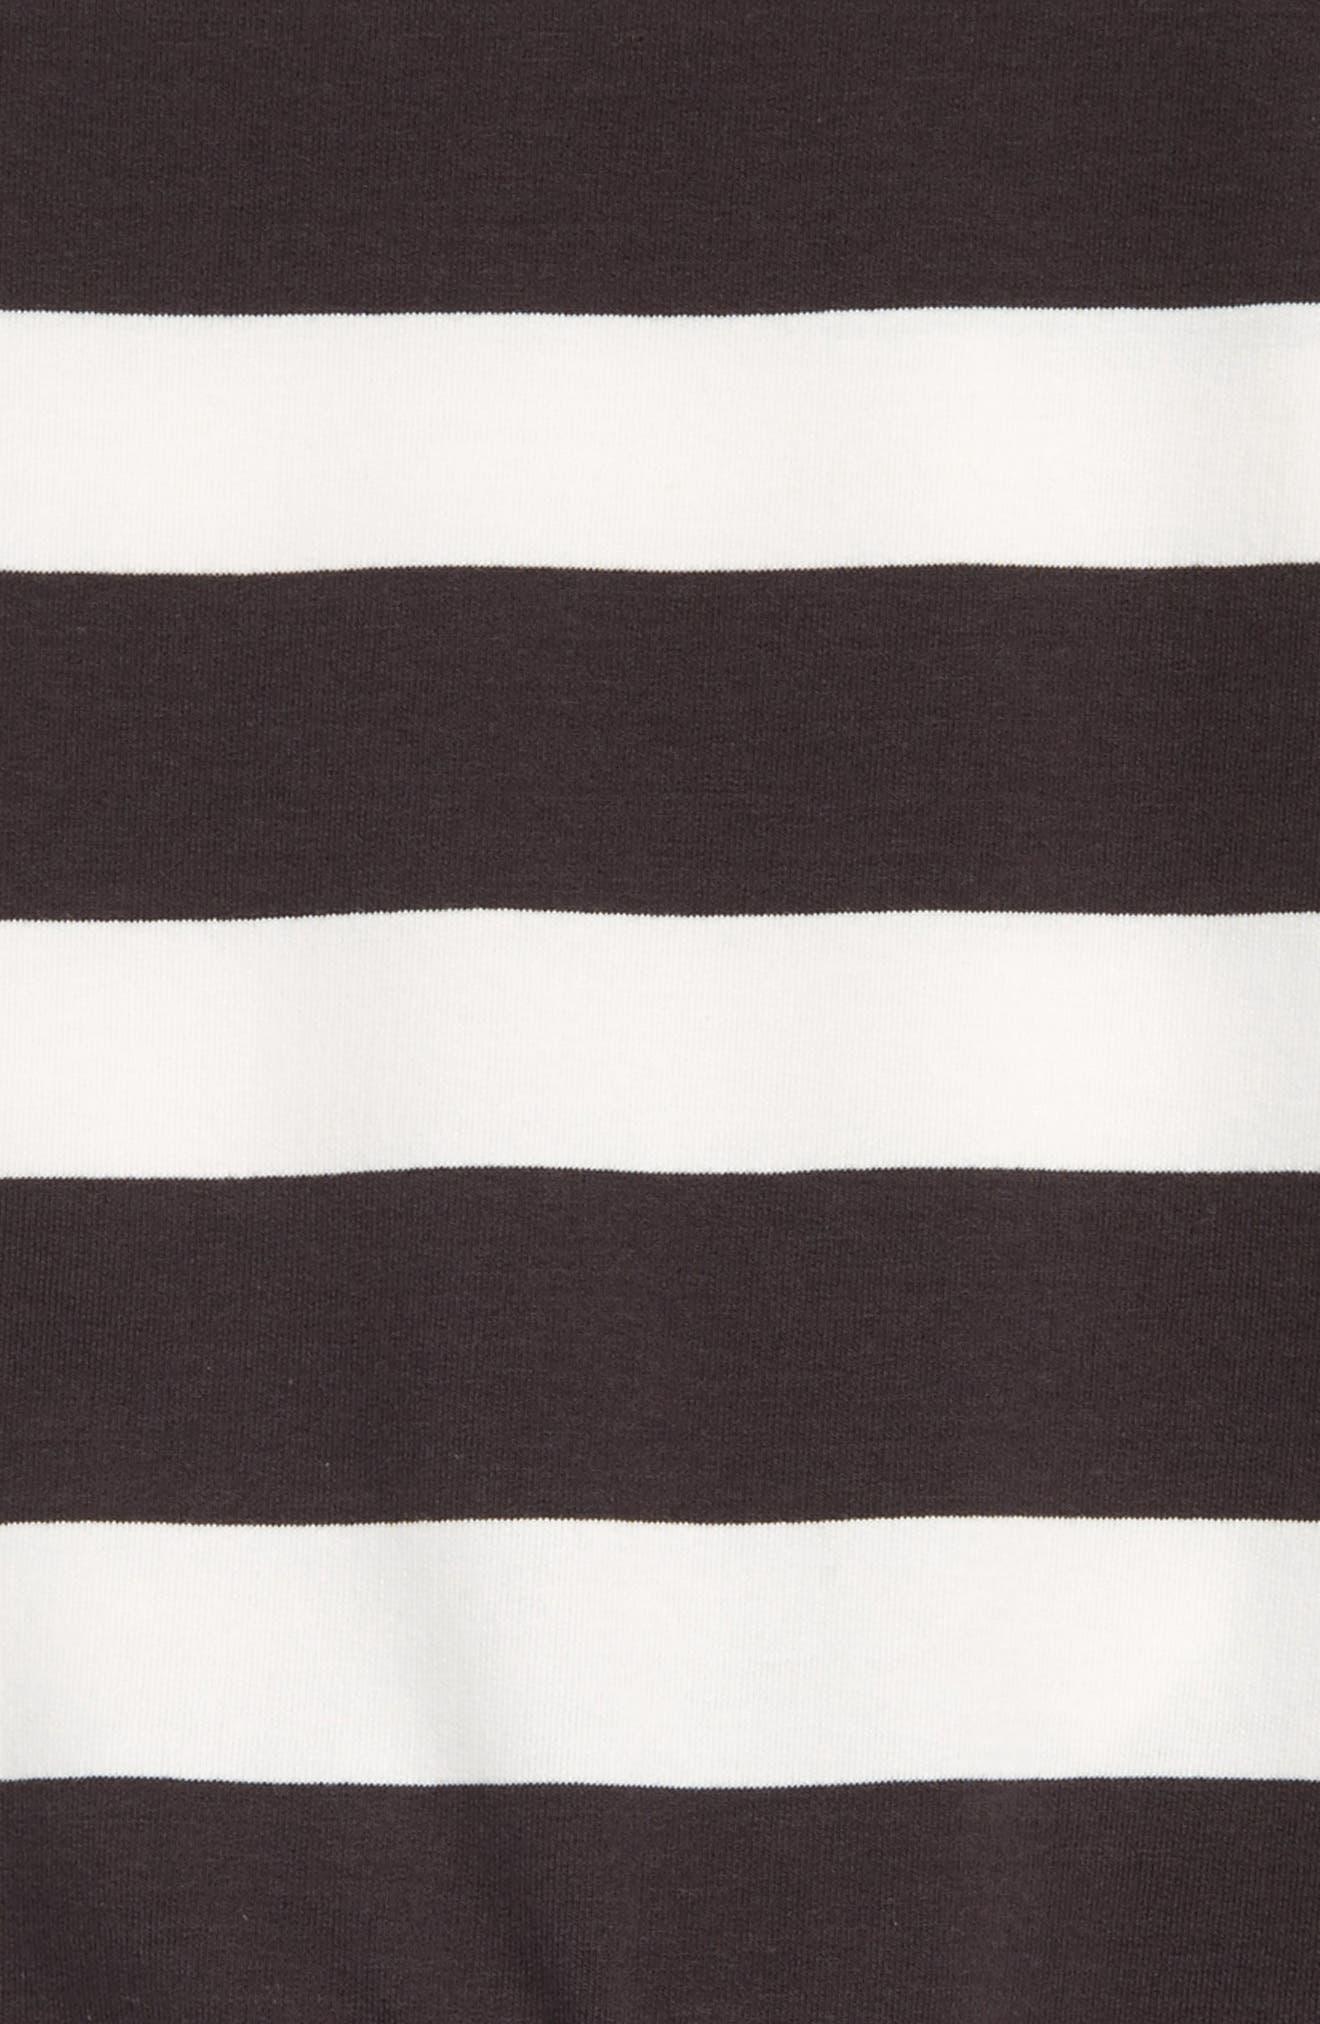 Stripe Romper,                             Alternate thumbnail 2, color,                             021